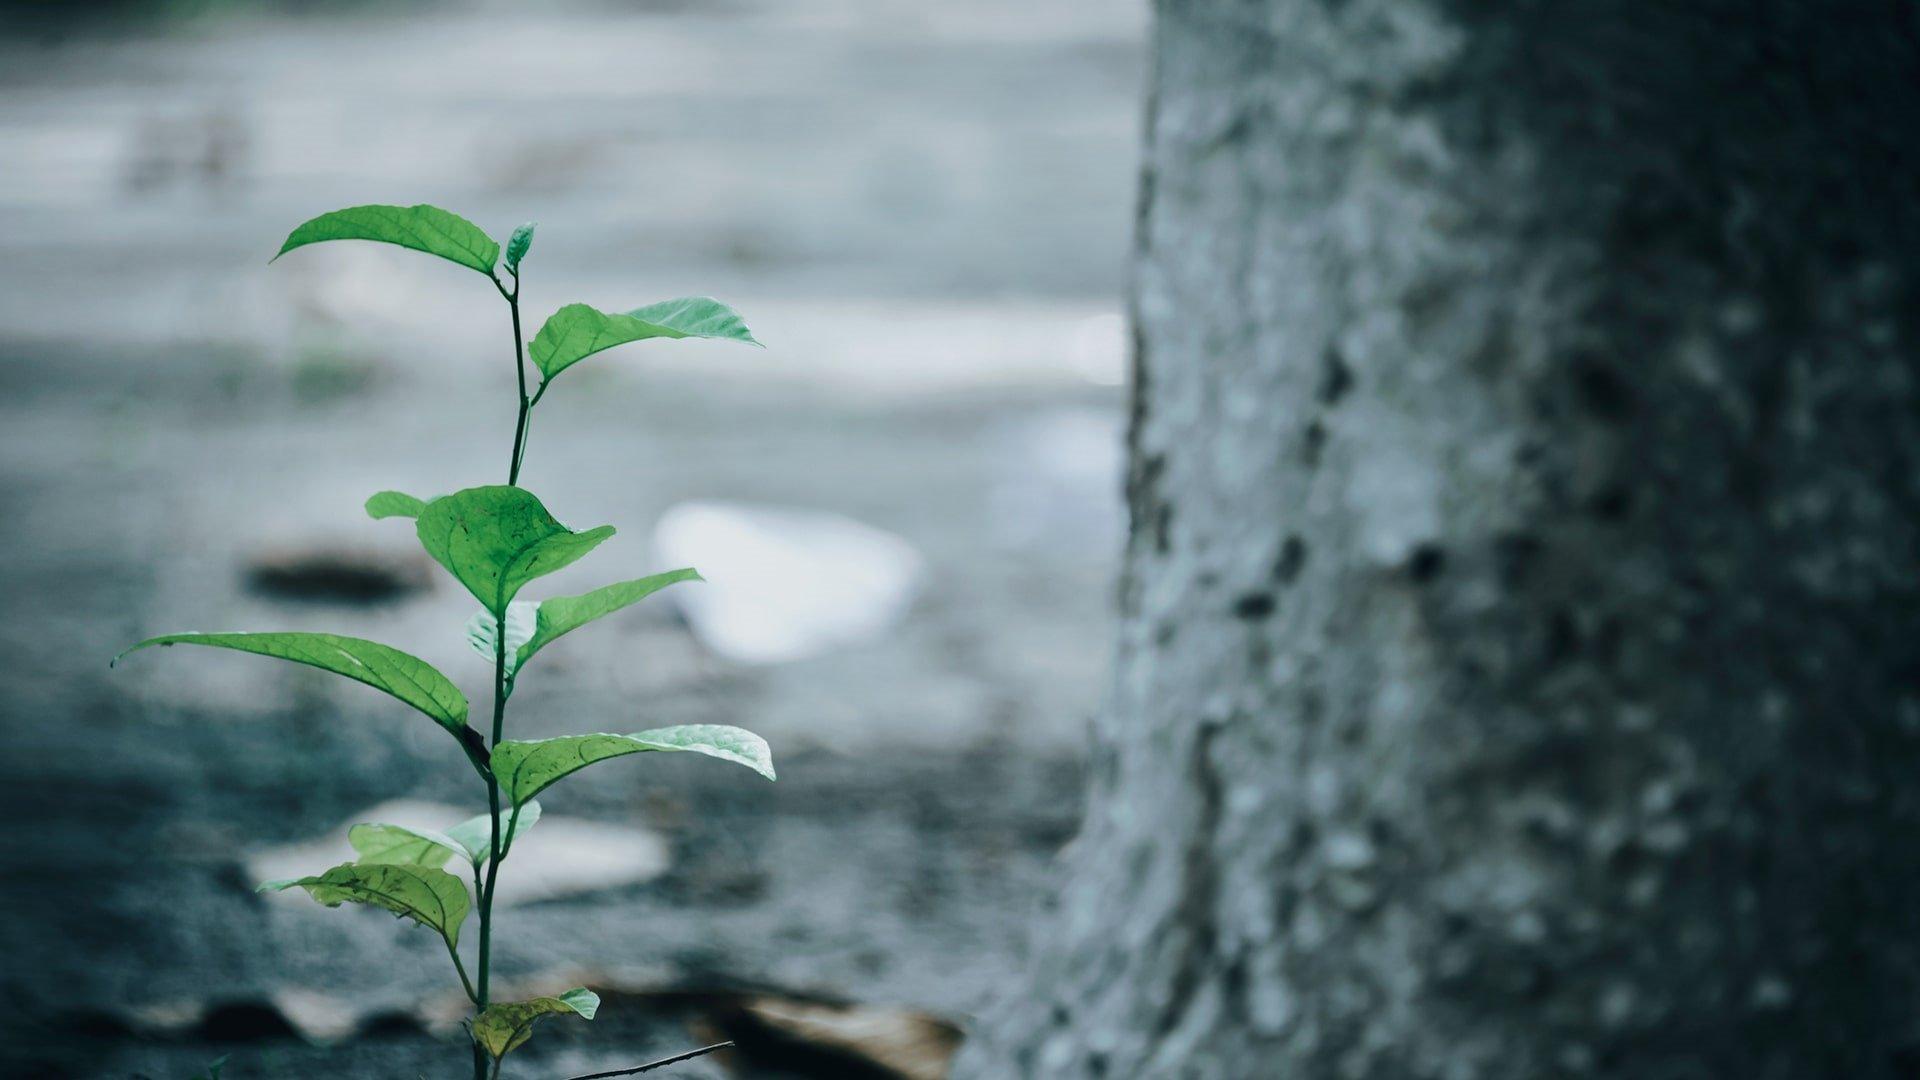 Tree Planted 1920 X 1080